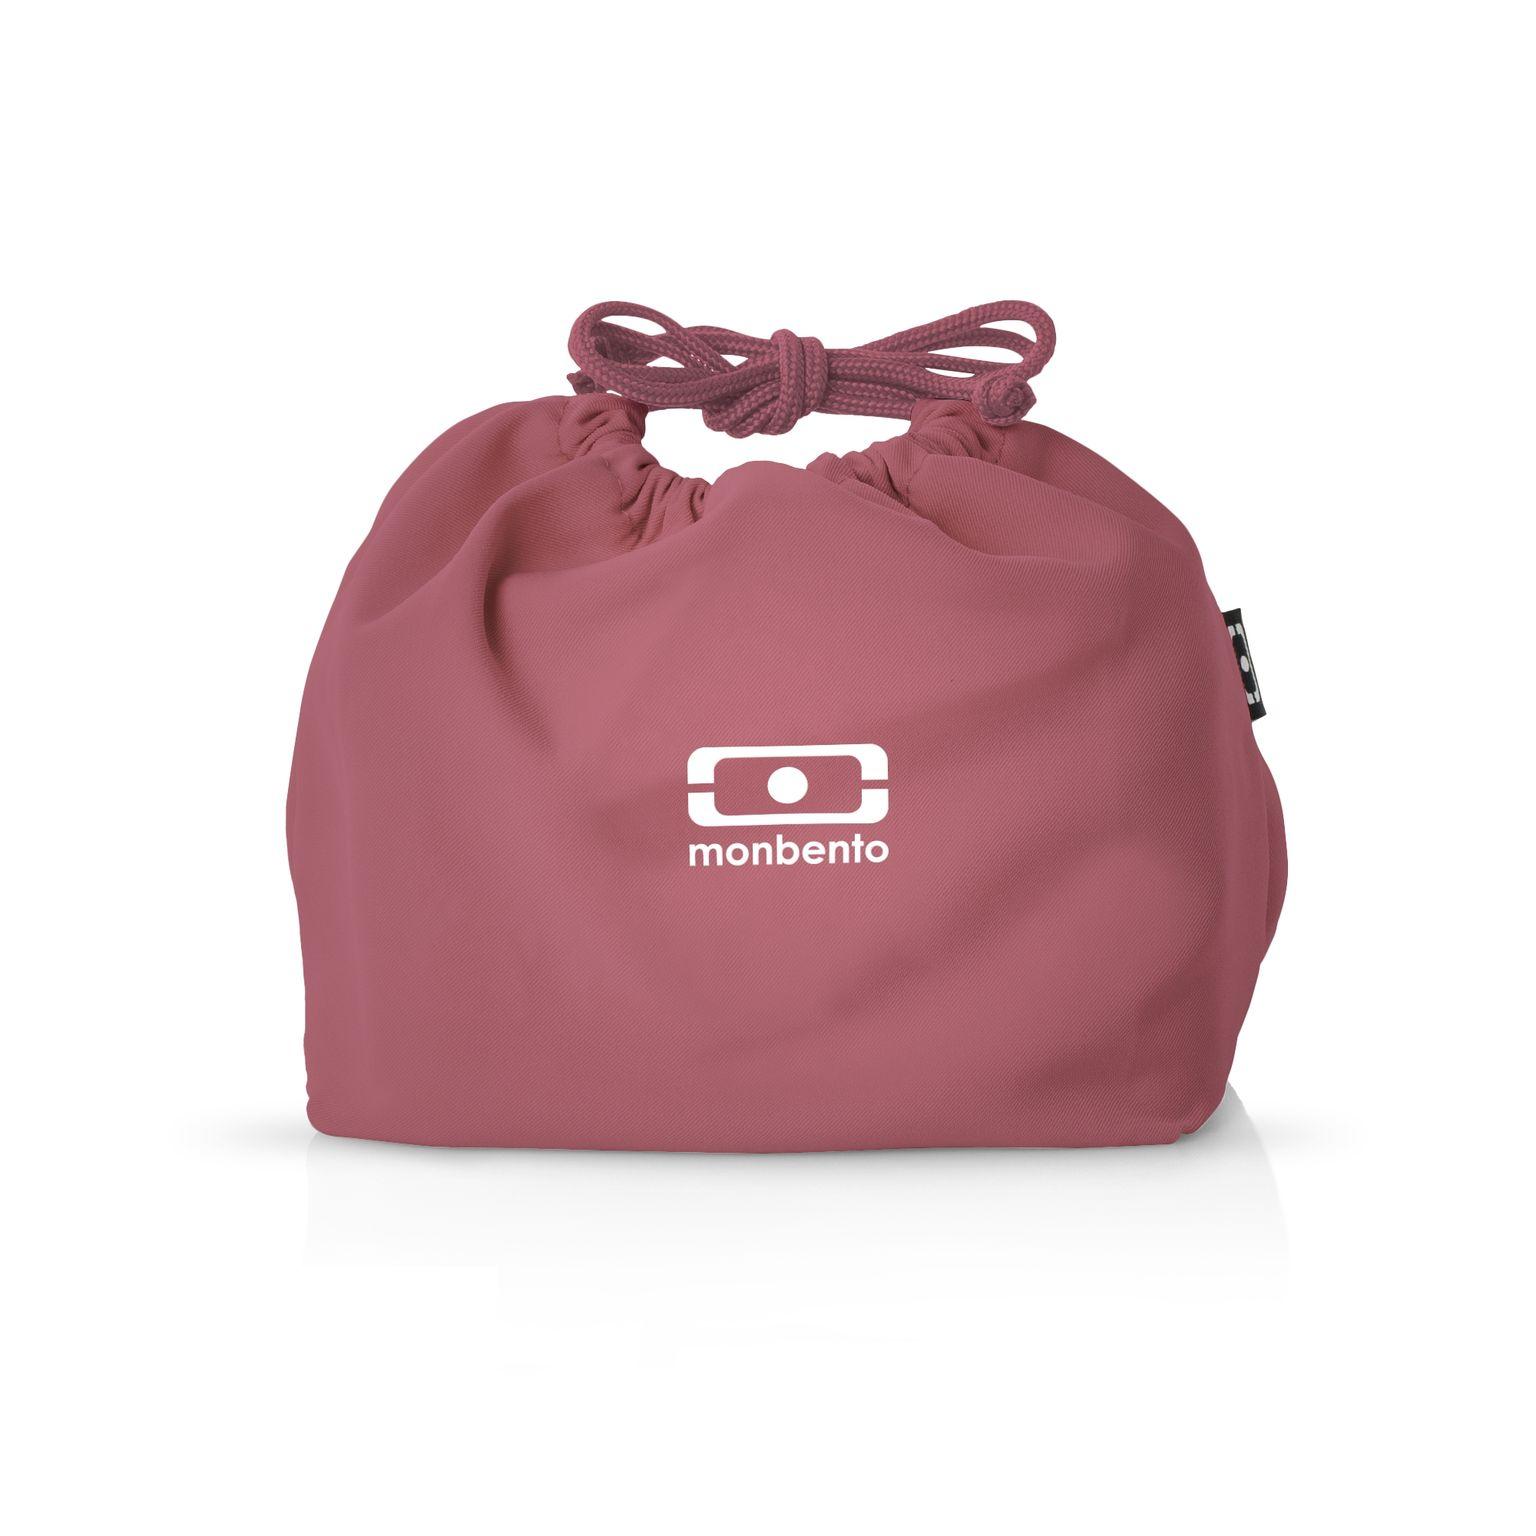 MB pocket blush